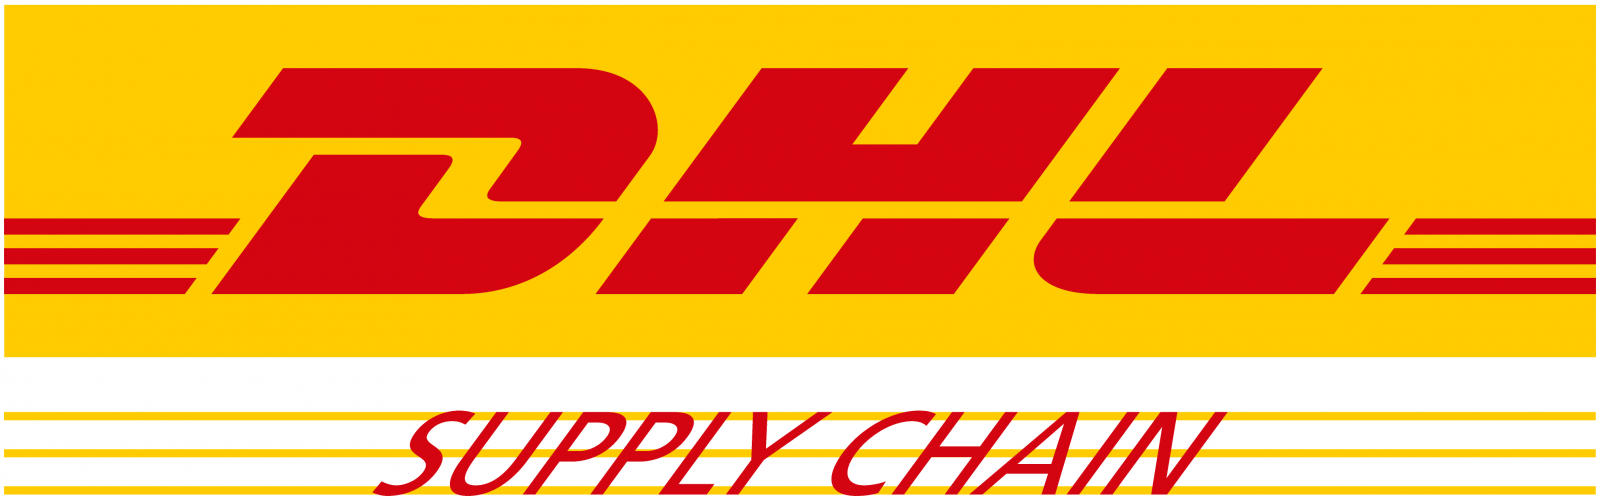 DHL Exel Supply Chain Exel (VietNam) LTD